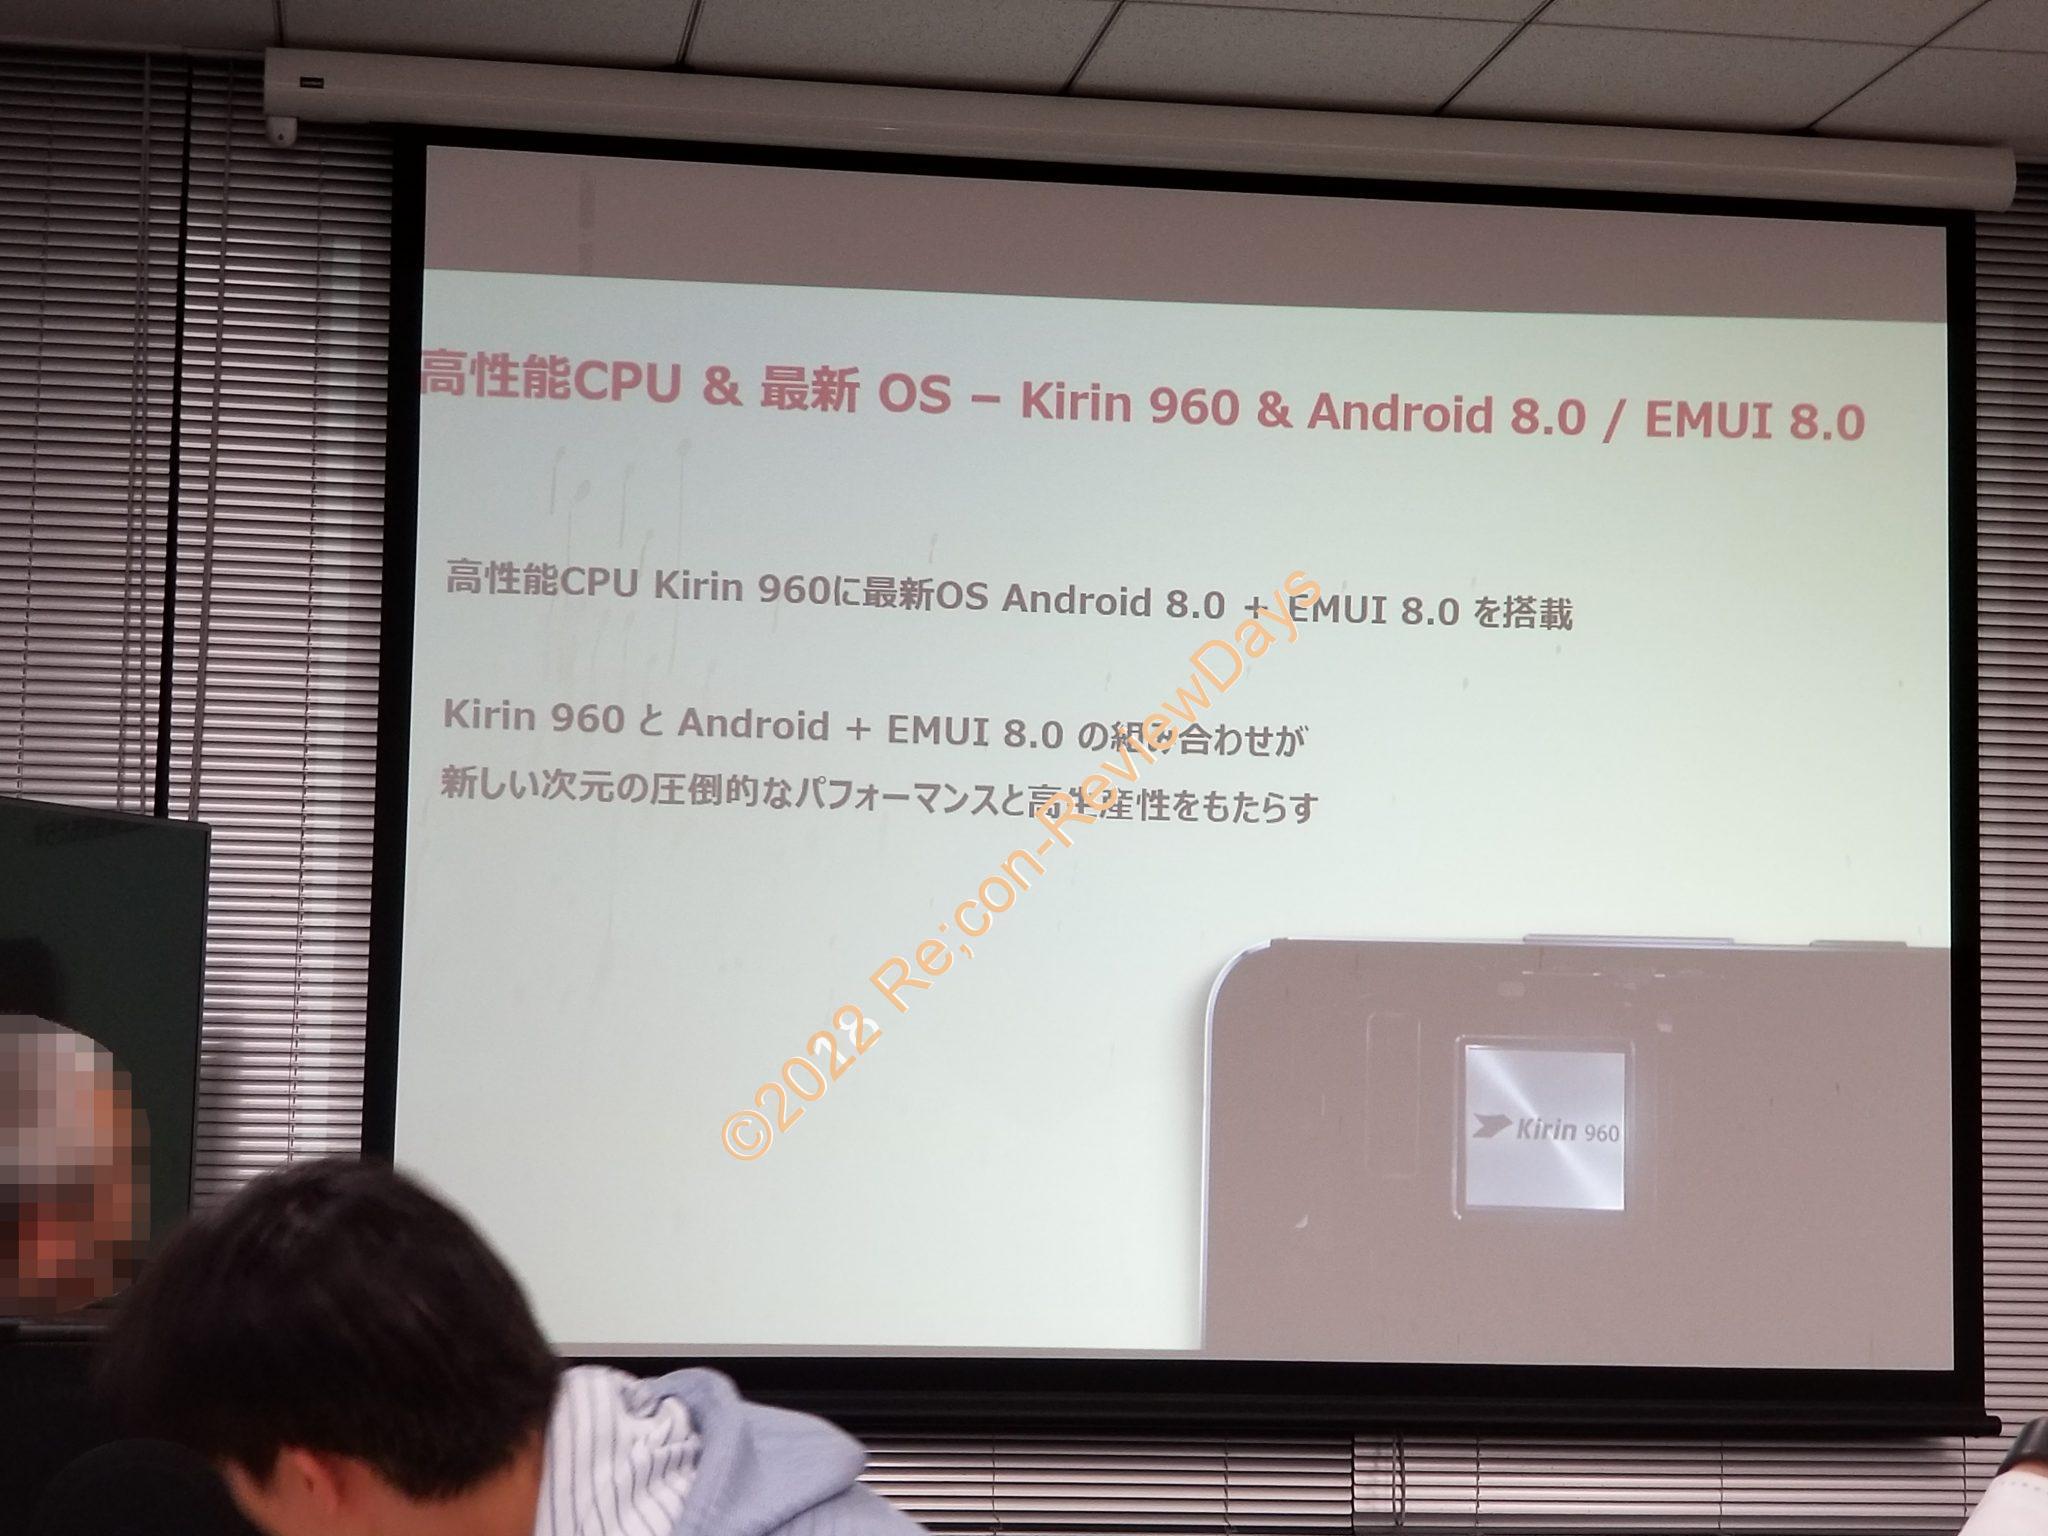 HUAWEI MediaPad M5 Proの使用感を簡単にまとめた #HUAWEI #MediaPad #MediaPadM5Pro #HUAWEIタッチアンドトライ